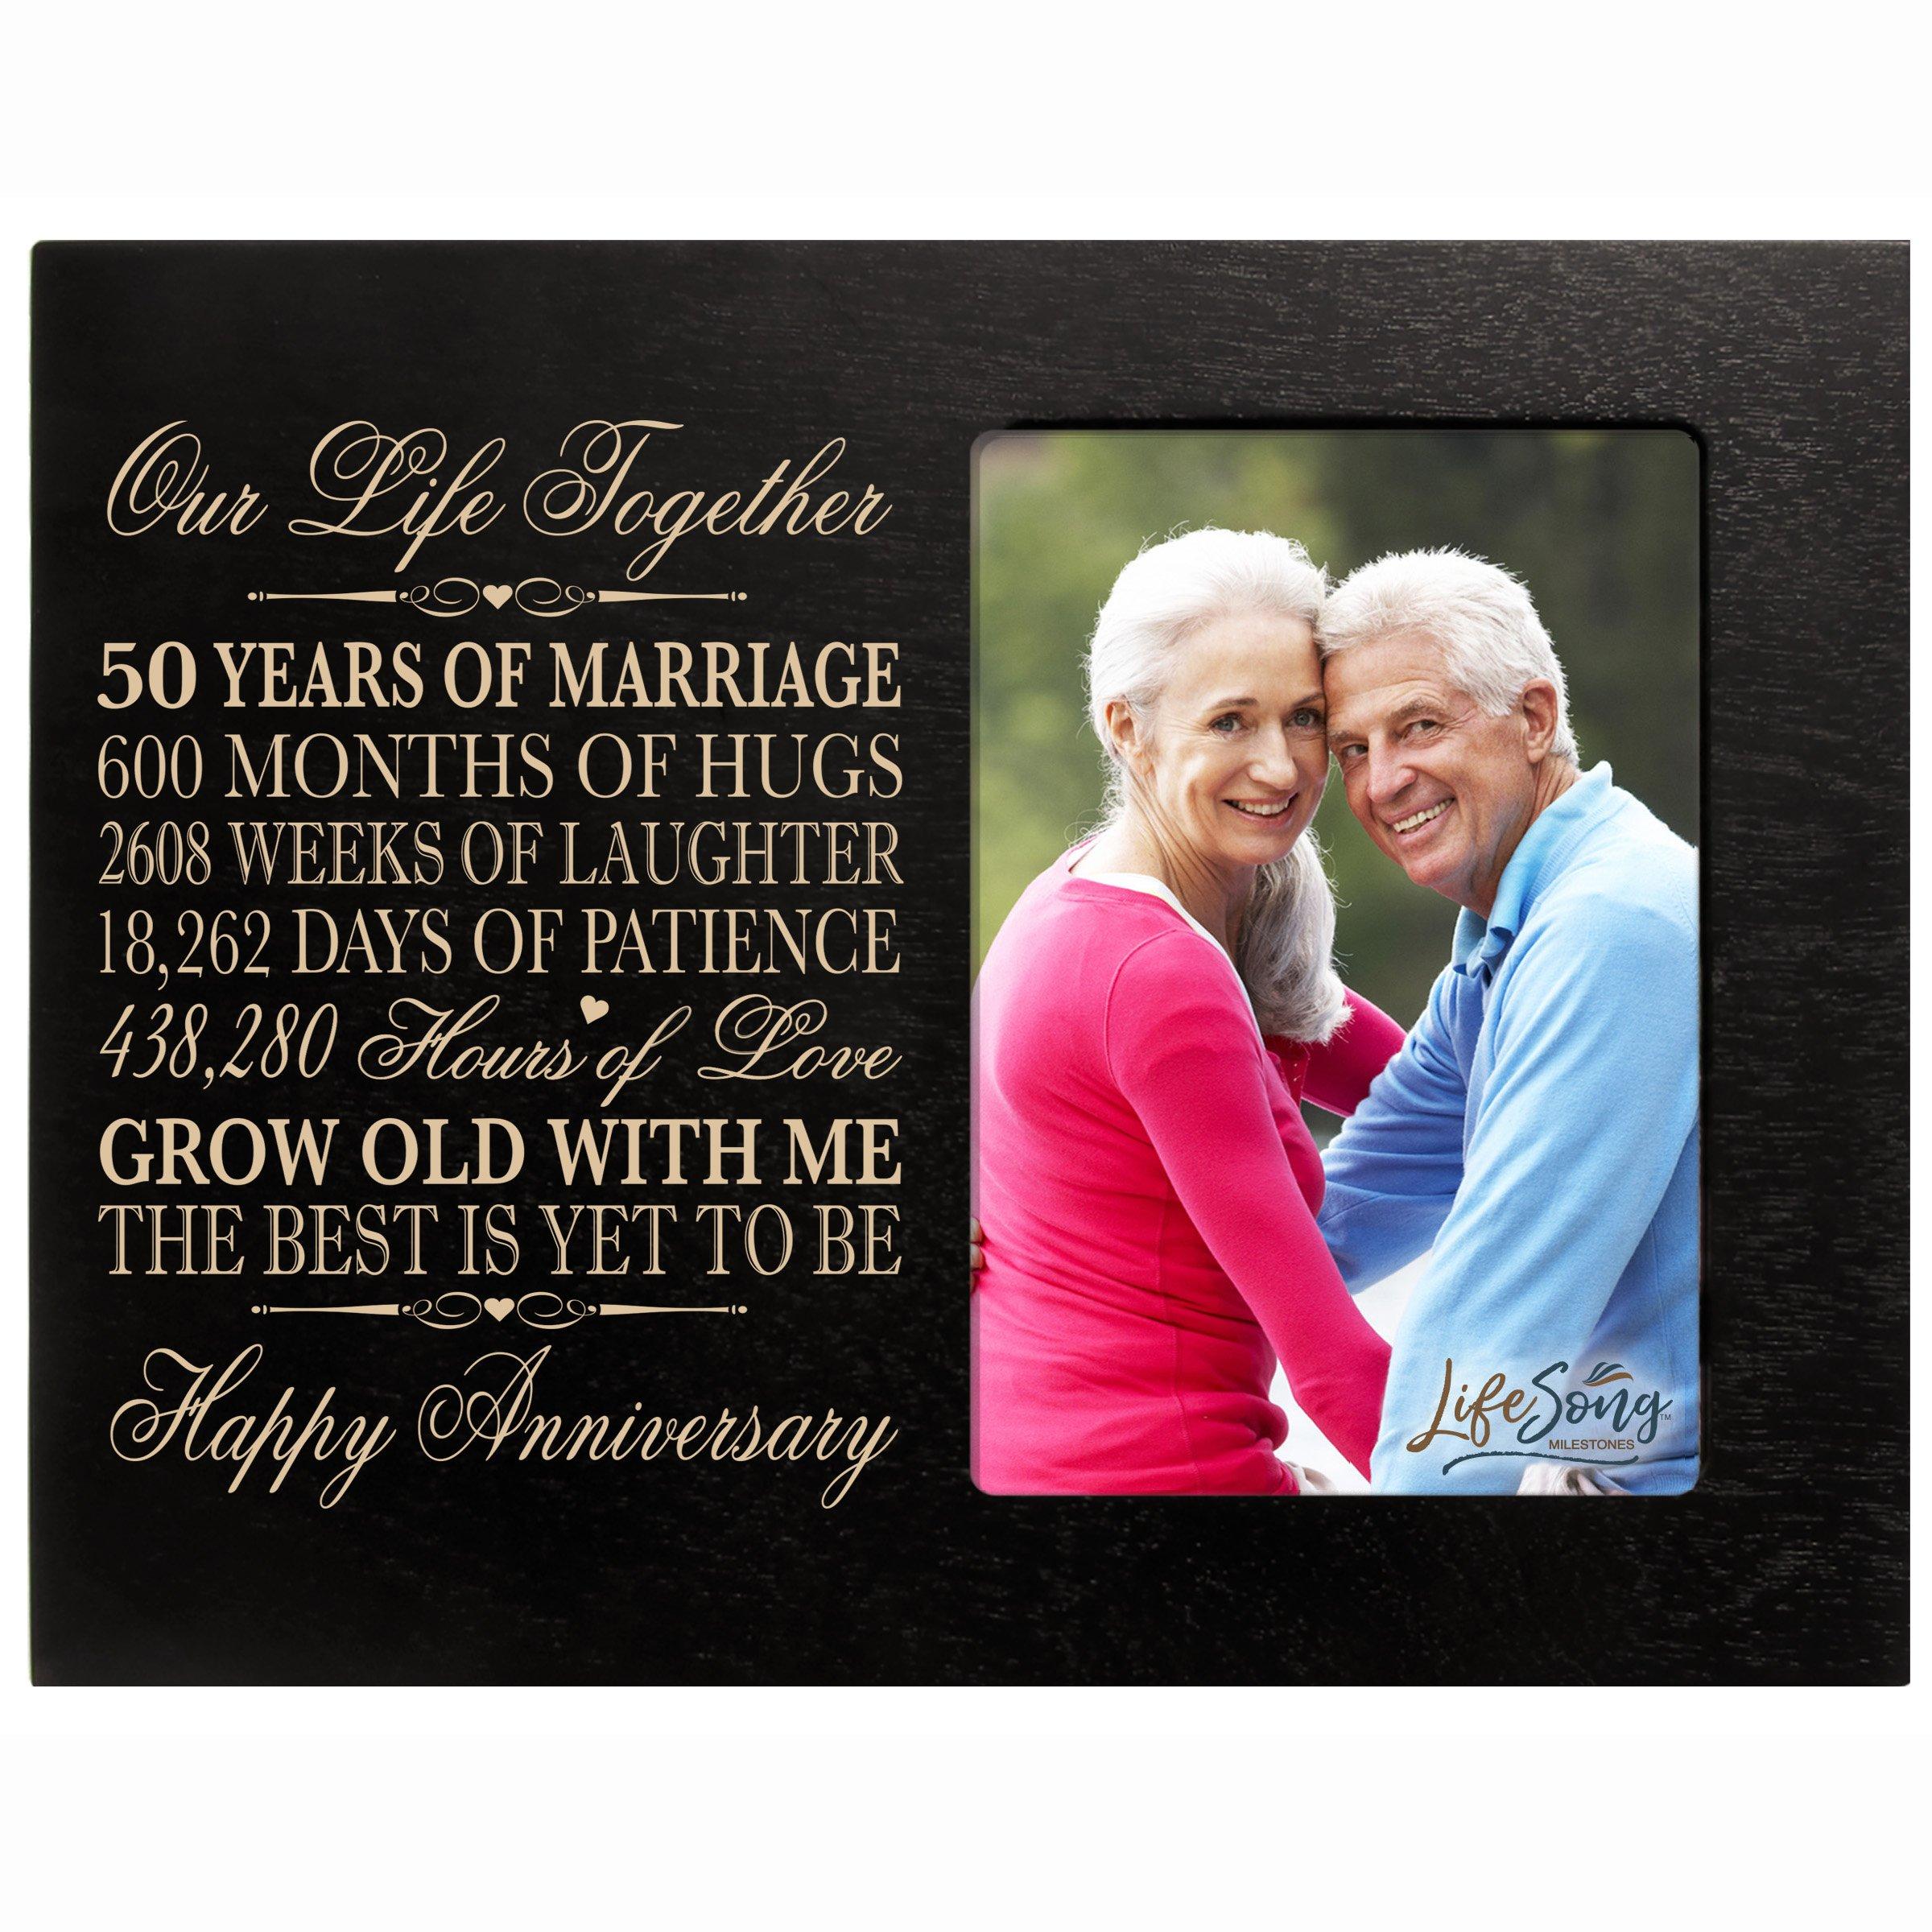 LifeSong Milestones 50th Year Wedding for Couple Custom Engraved Wedding Celebration Frame Holds 1 4x6 Photo 8'' H X 10'' W (Black)